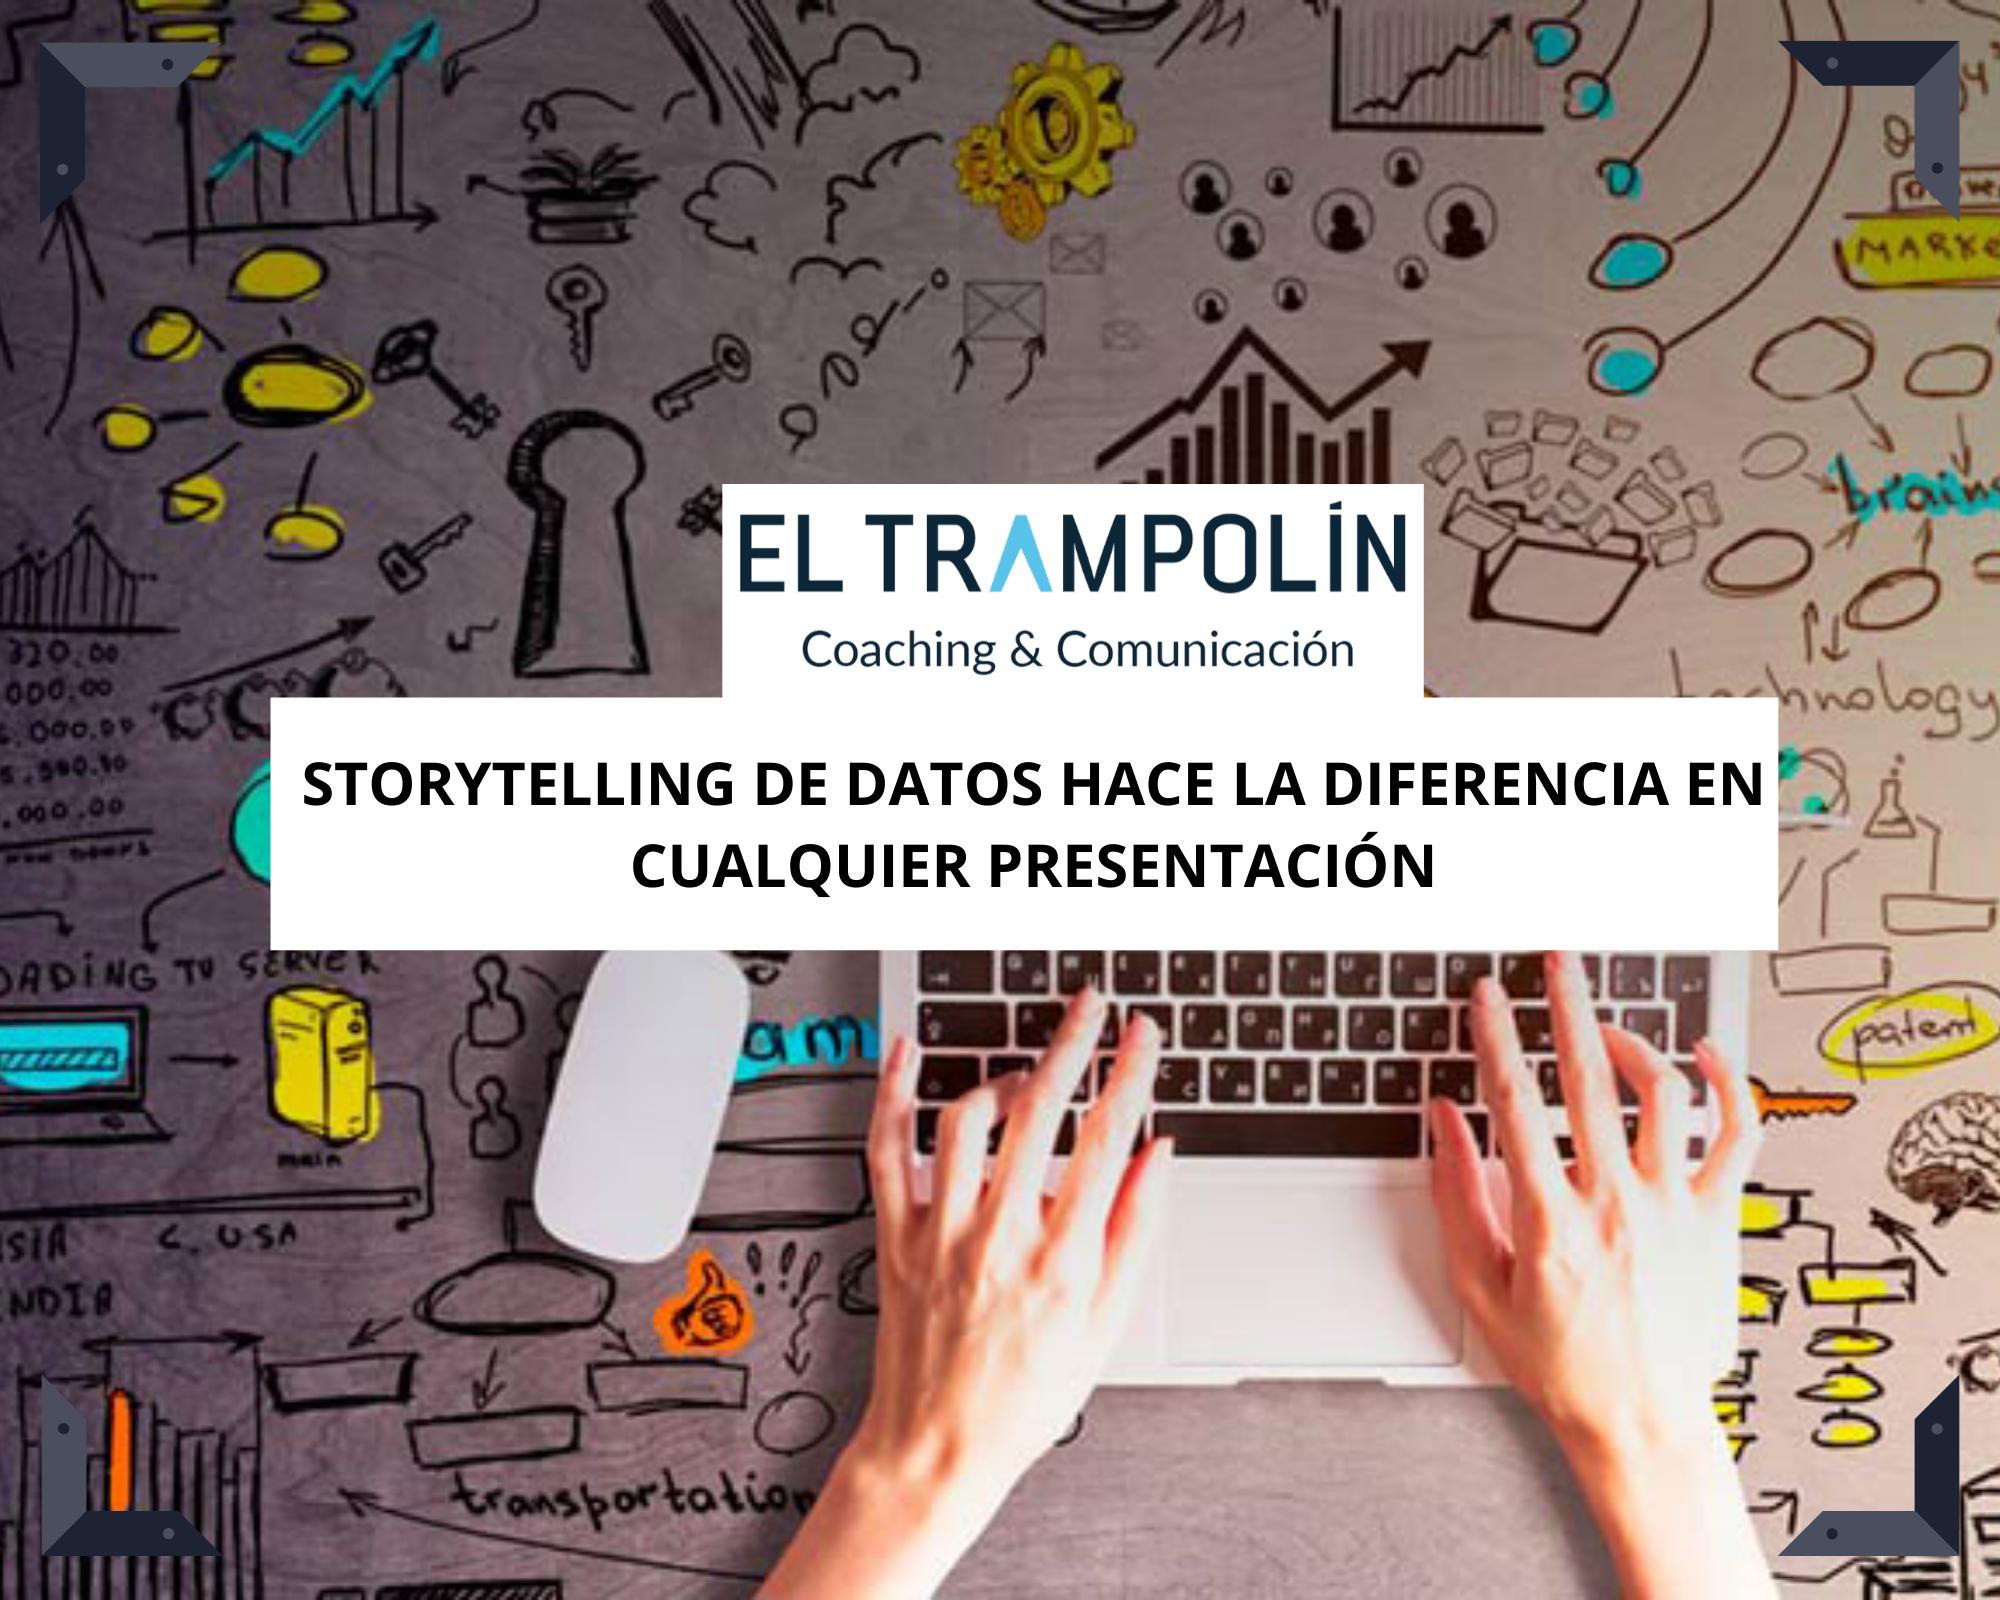 STORYTELLING DE DATOS